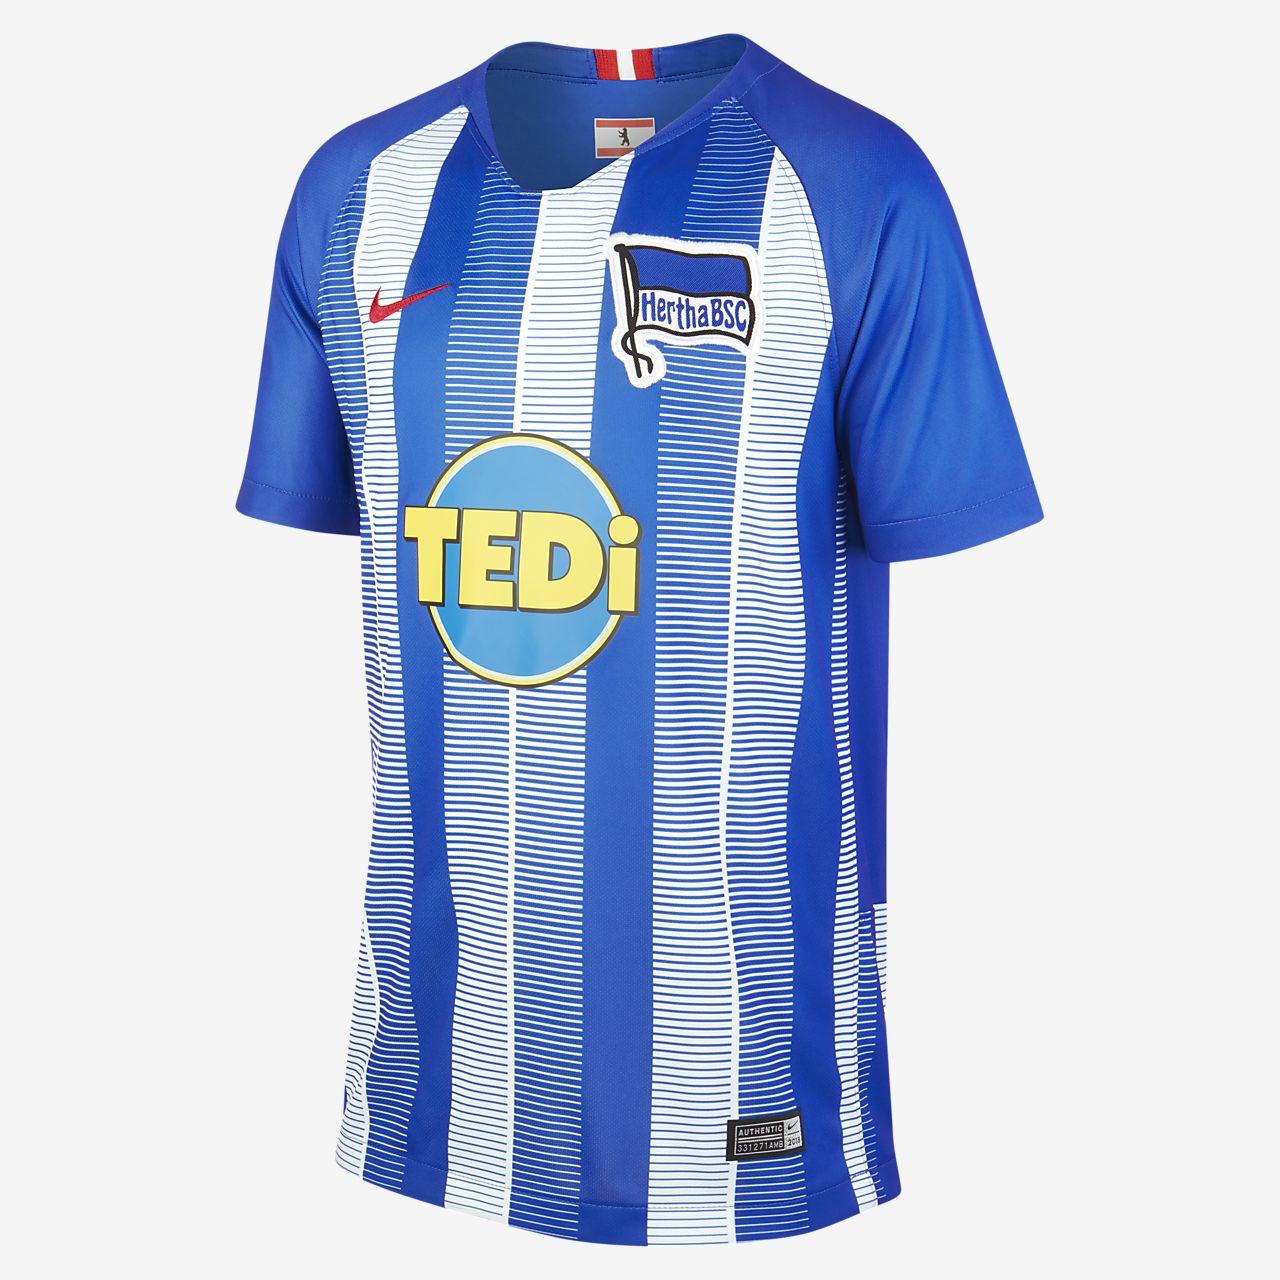 2018 19 Hertha BSC Stadium Home Camiseta de fútbol - Niño a. Nike.com ES 21830522c3b80